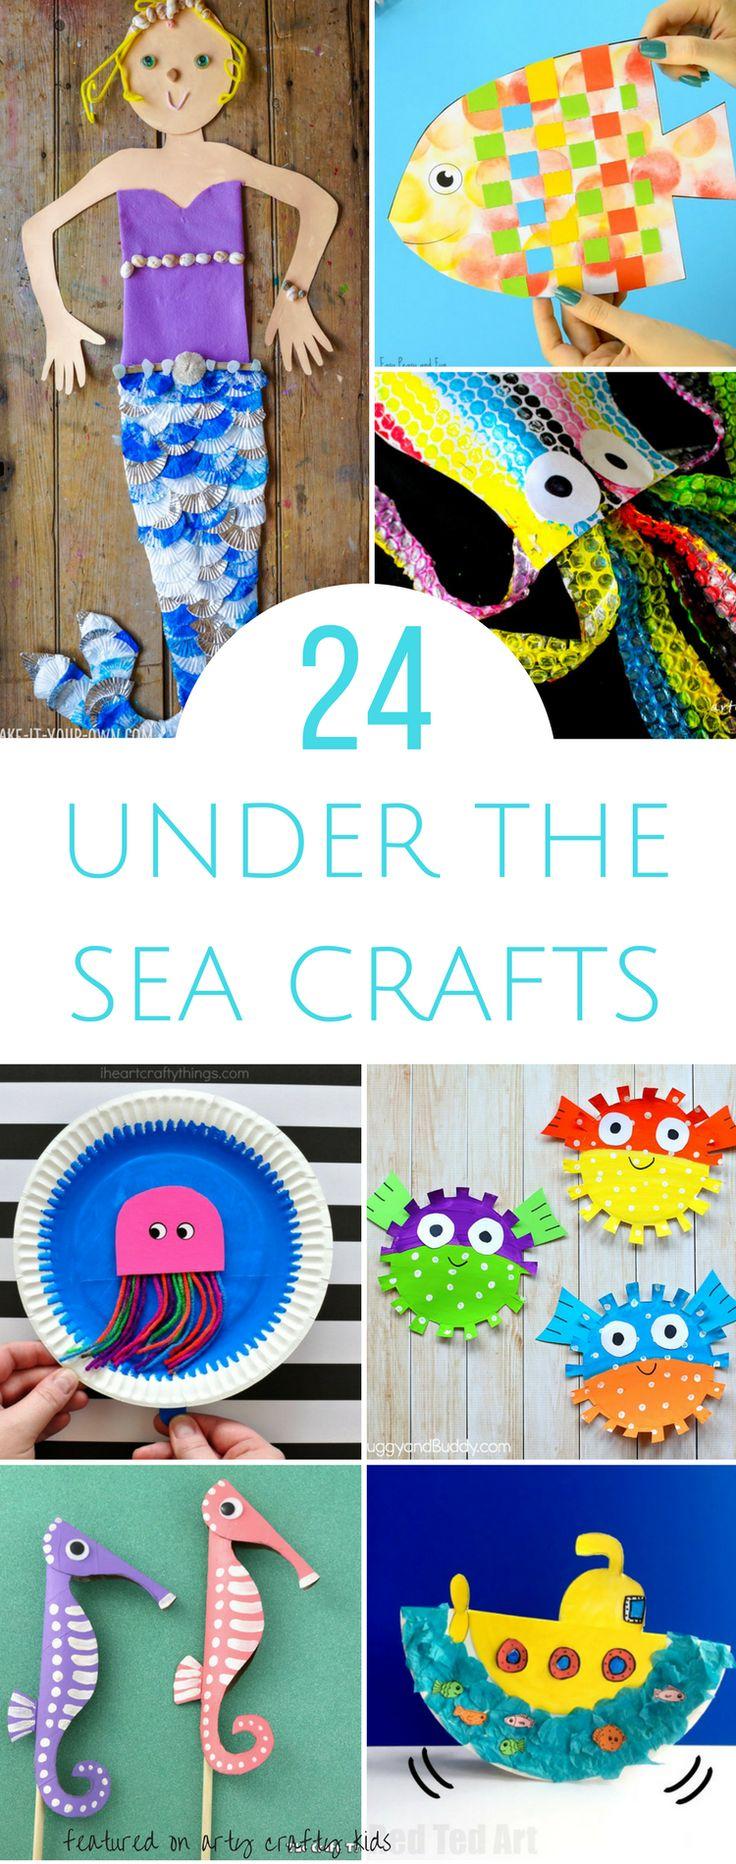 Arty Crafty Kids | Craft | Under the Sea Crafts | 24 Awesome Under the Sea crafts for kids